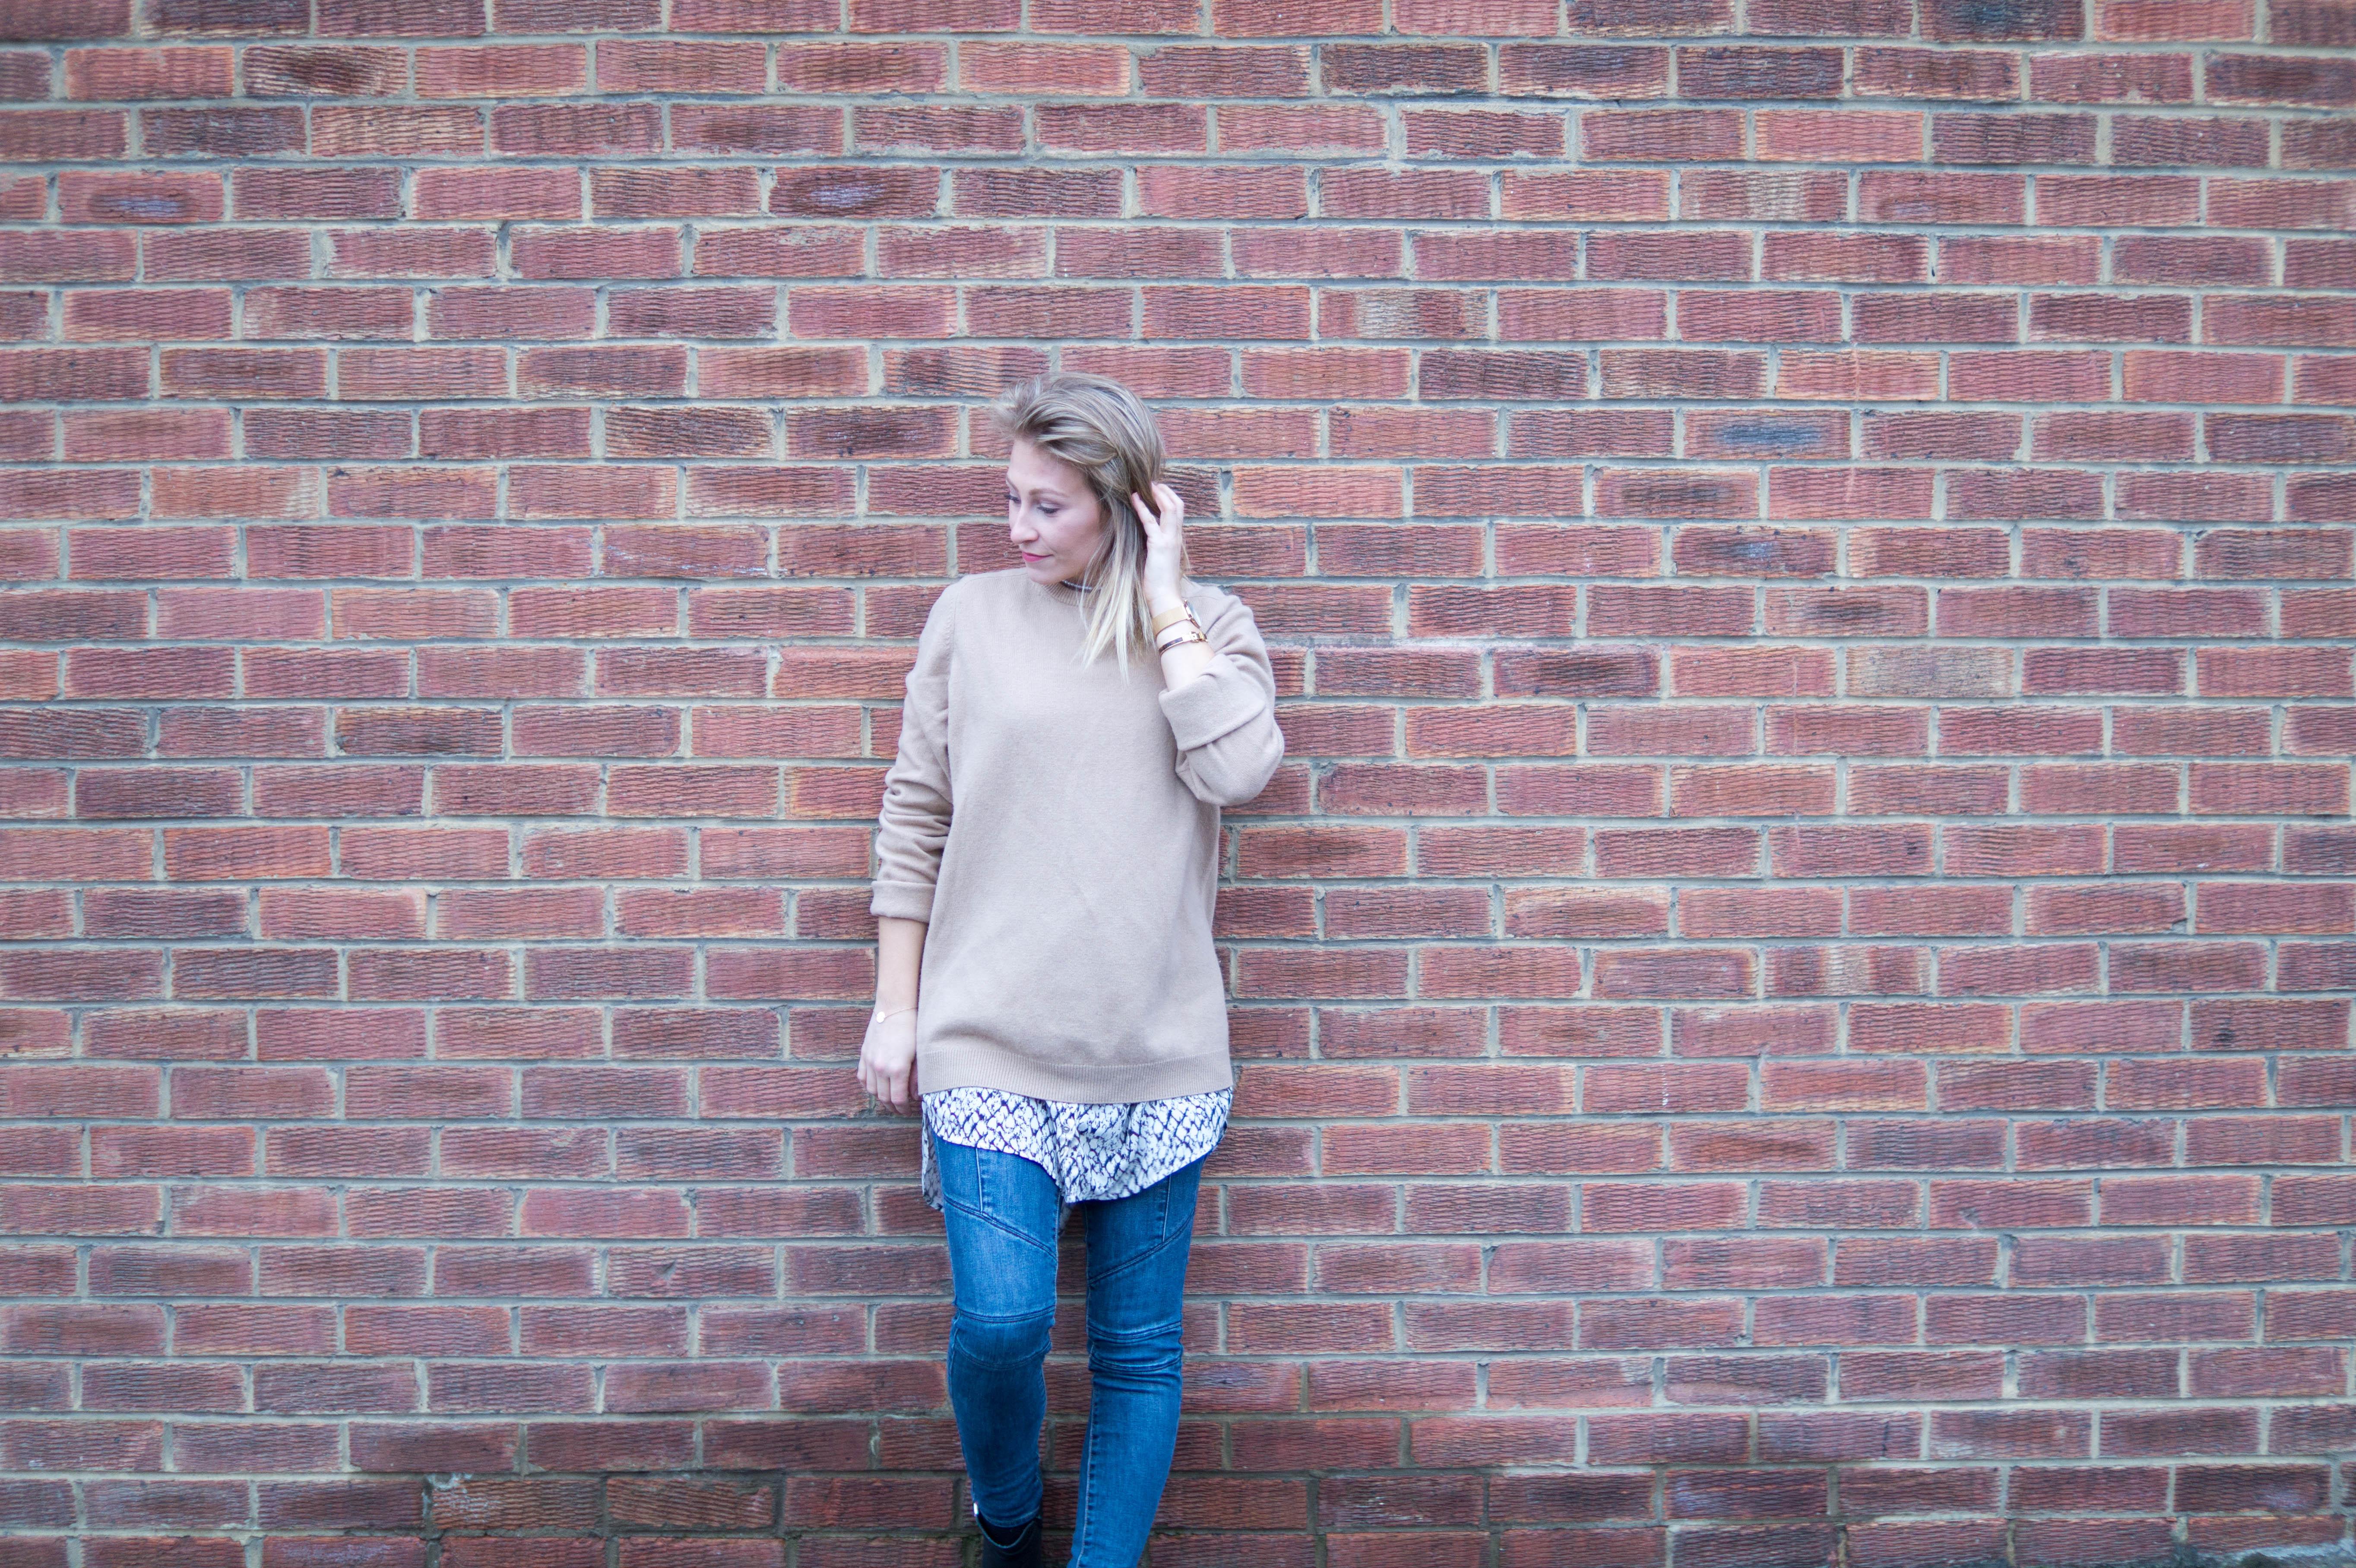 brick walls outfit post primetime chaos camel knit fashion